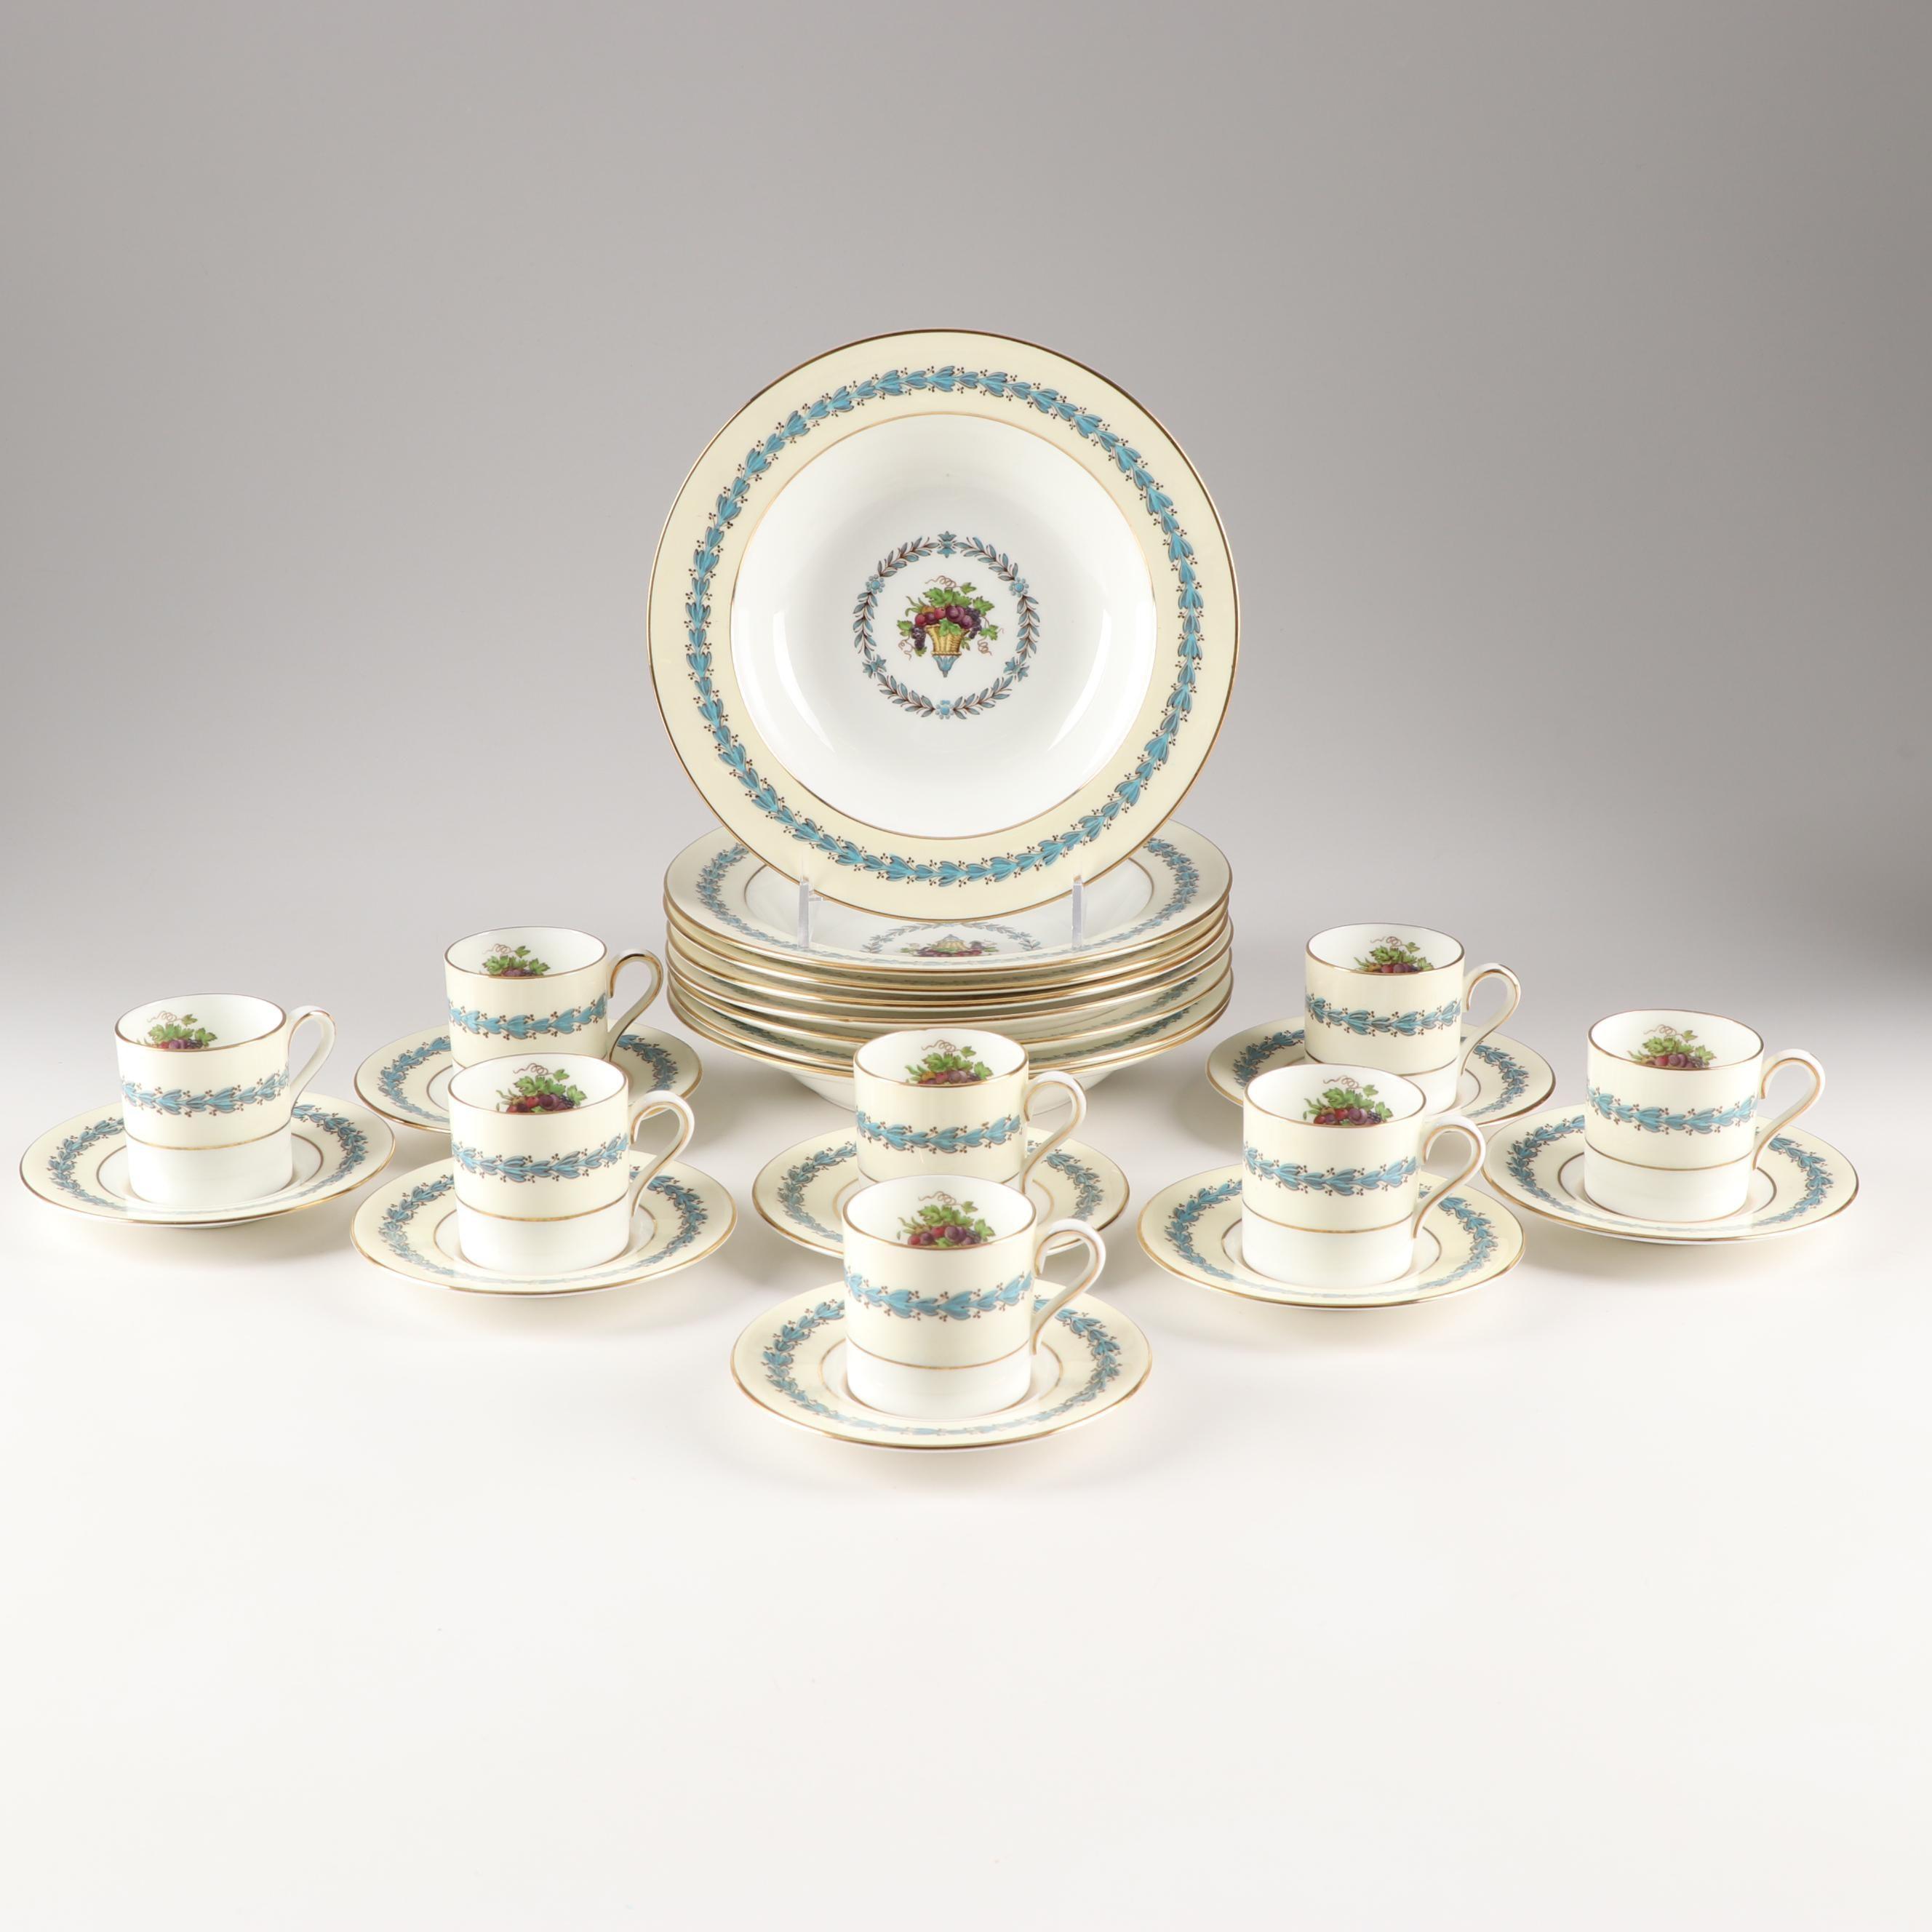 "Wedgwood ""Appledore"" Bone China Demitasse Cups, Saucers and Bowls"